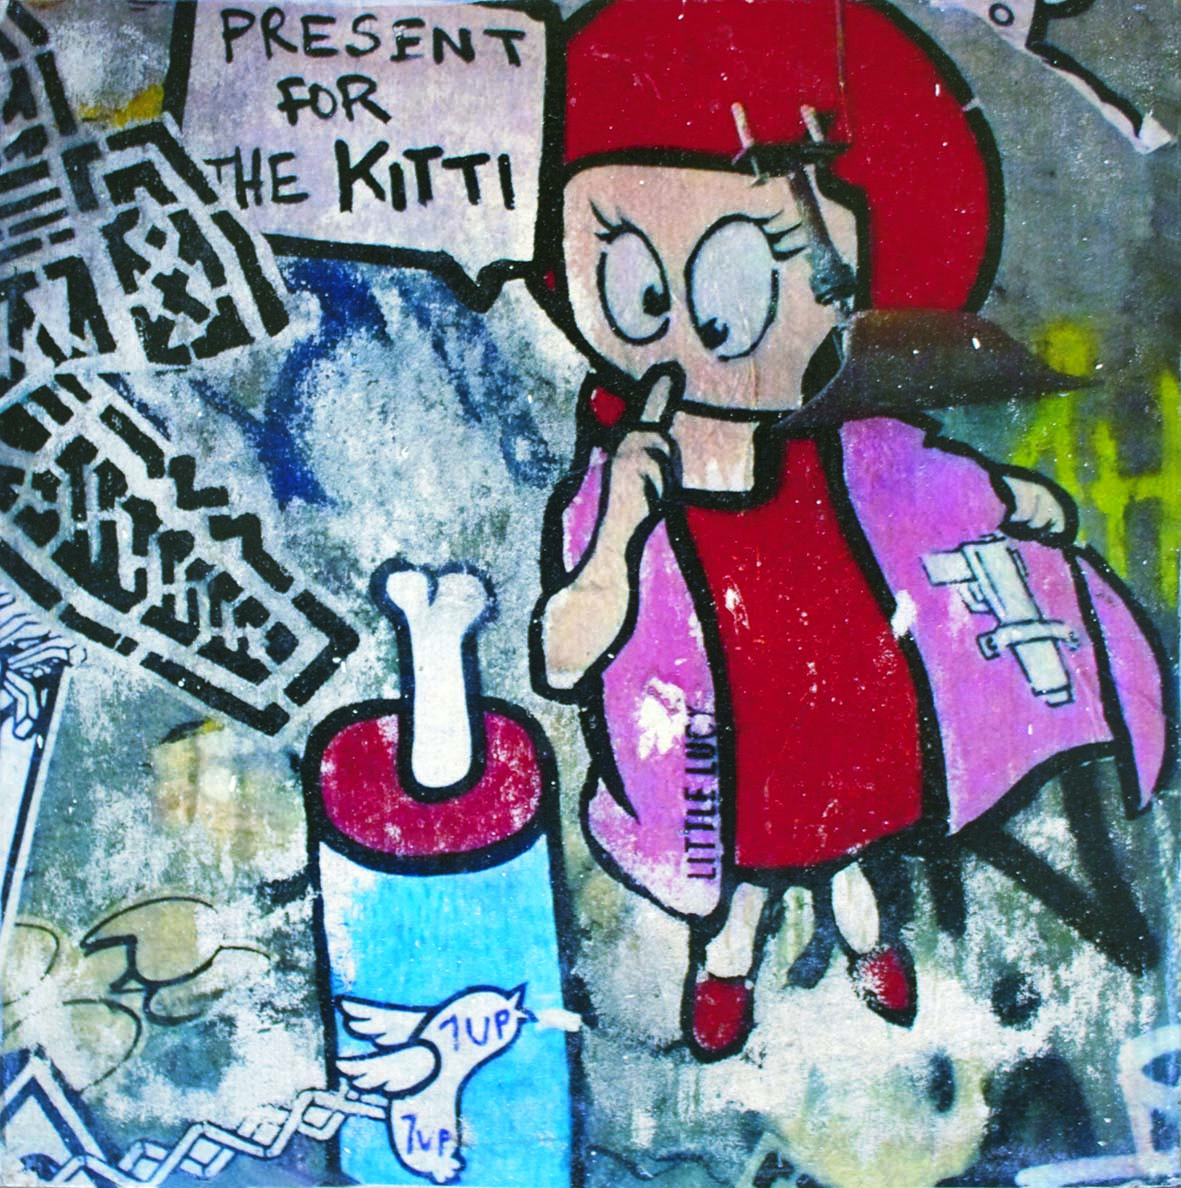 PRESENT FOR THE KITTI 2017 / Transferdruck auf MDF-Block / 20x20 cm